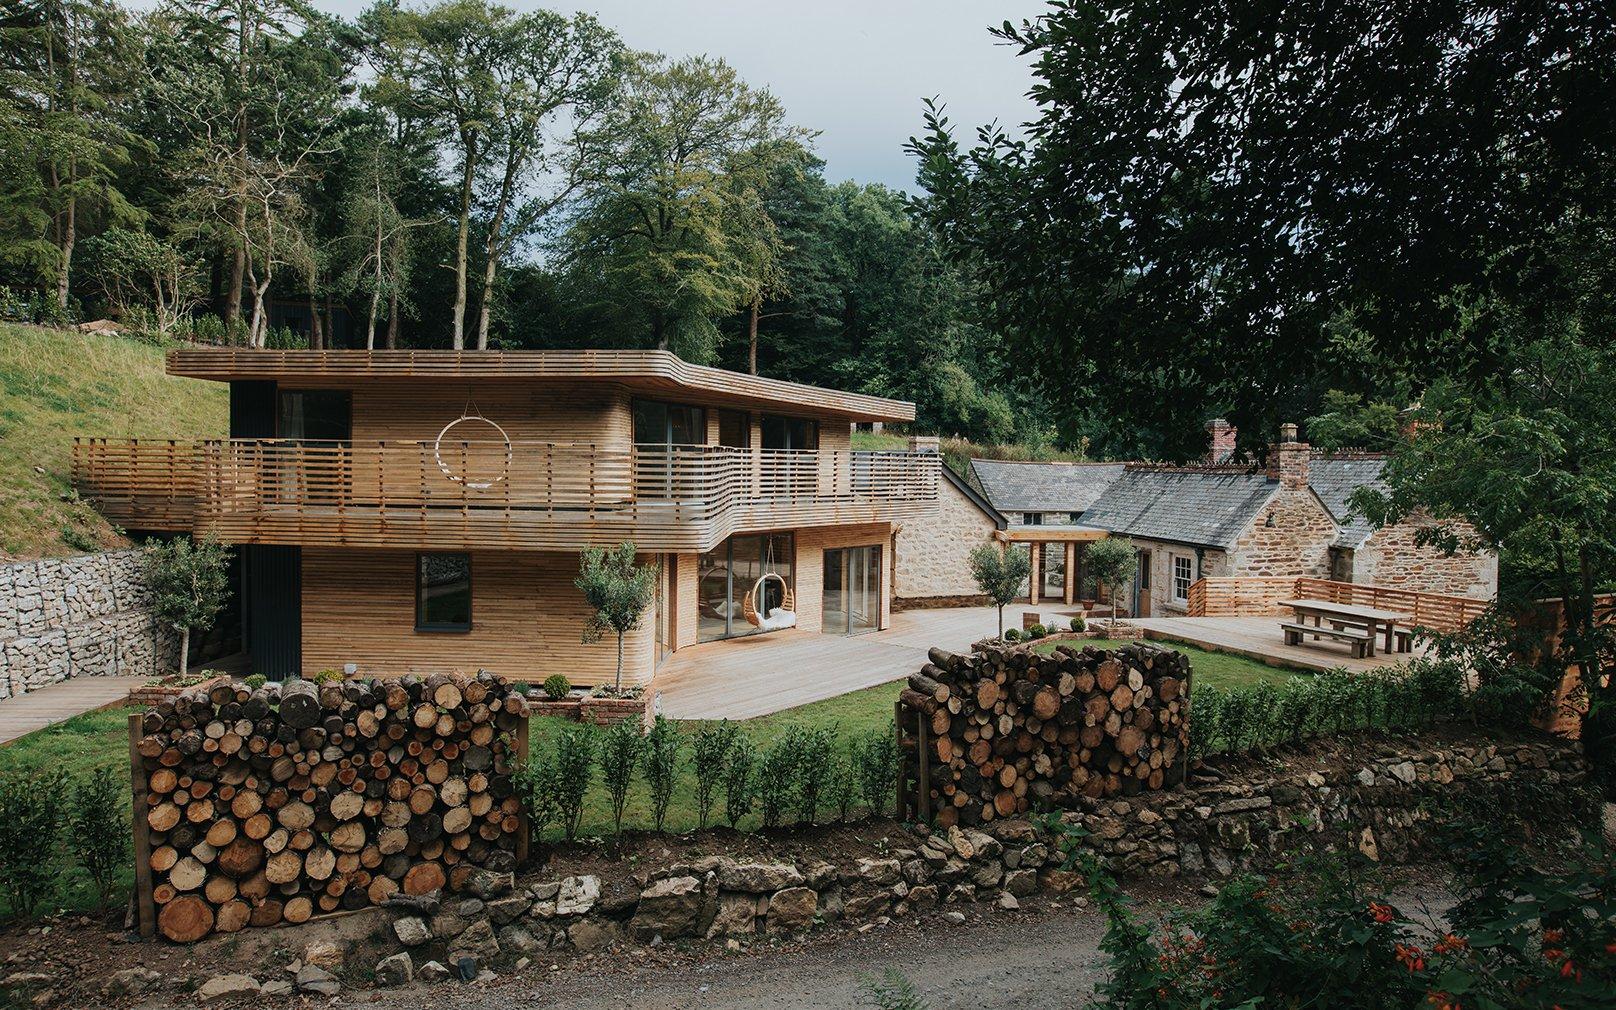 Tom Raffield's Grand Design Home